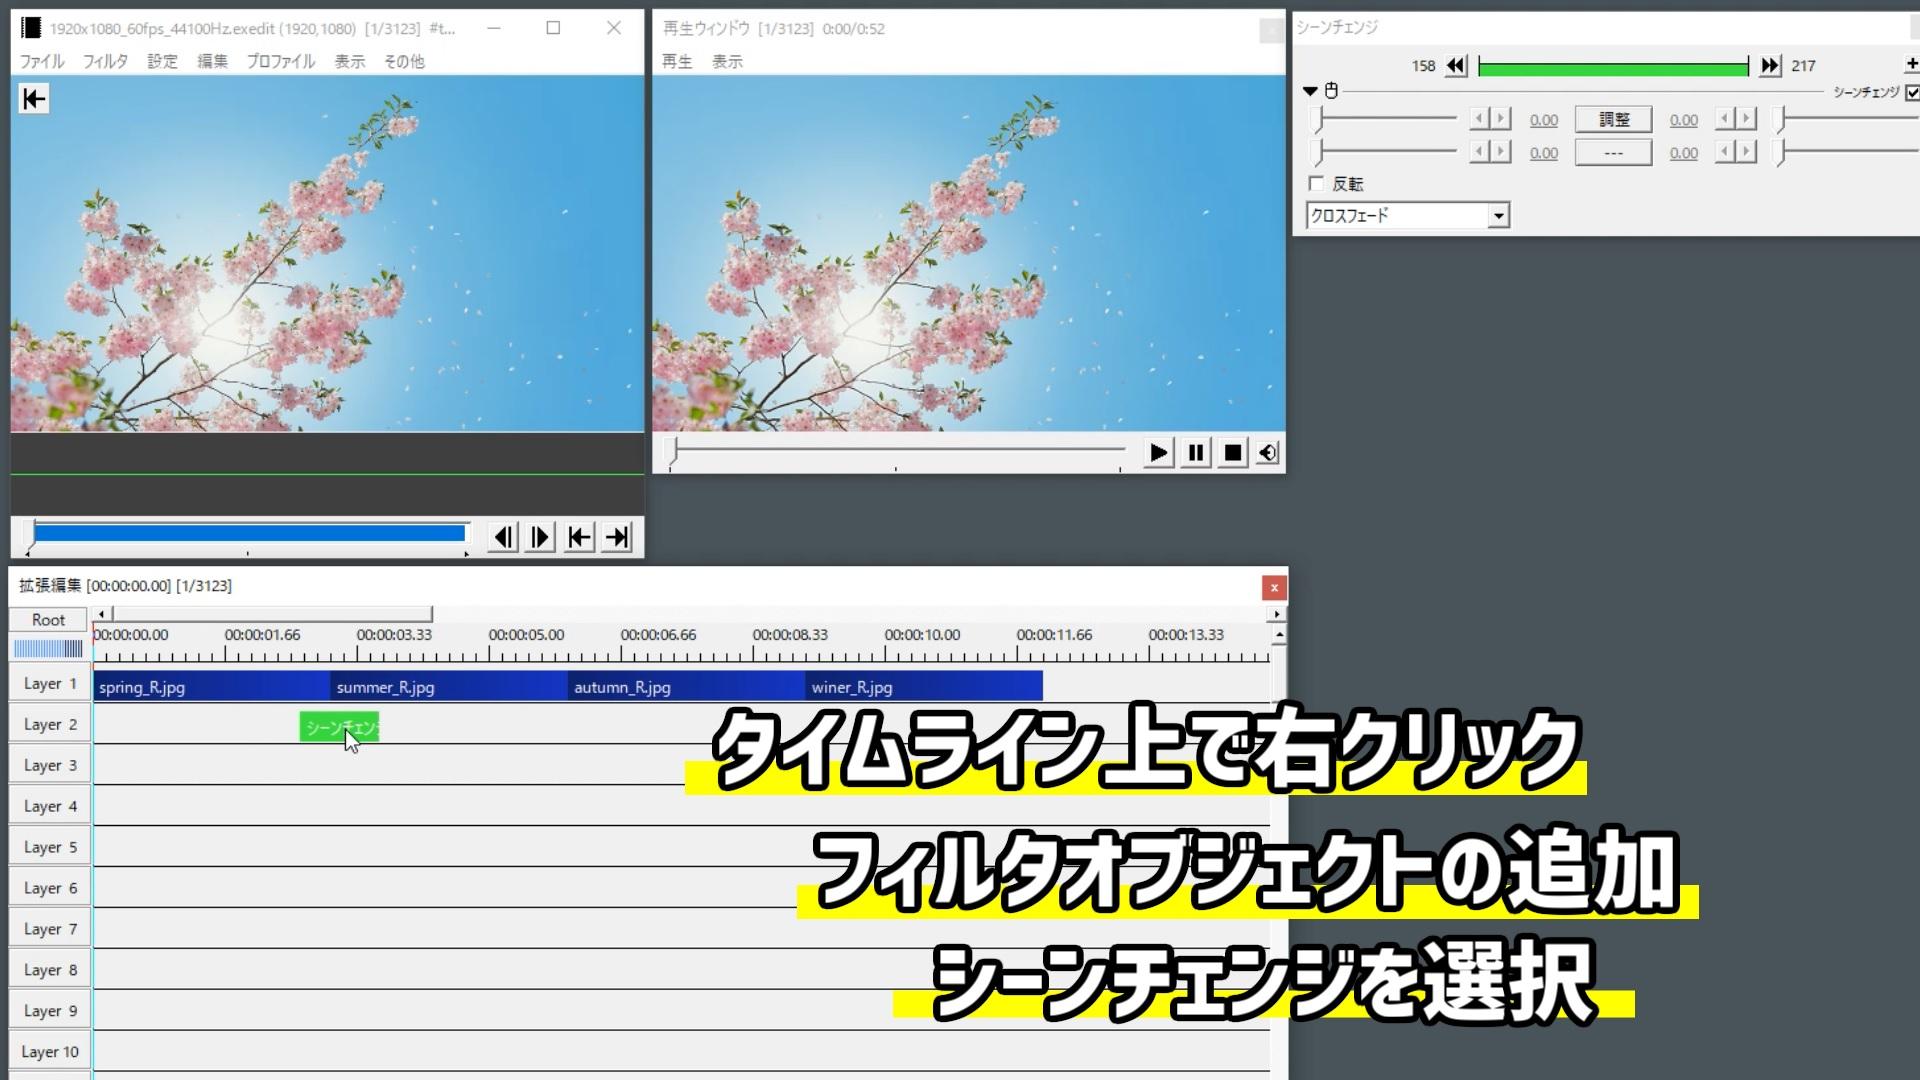 AviUtlでシーンチェンジ(トランジション)を使う方法は簡単です。 ①:タイムライン上で右クリック ②:フィルタオブジェクトの追加 ③:シーンチェンジを選択 これでシーンチェンジ(緑色のオブジェクト)が出てきます。